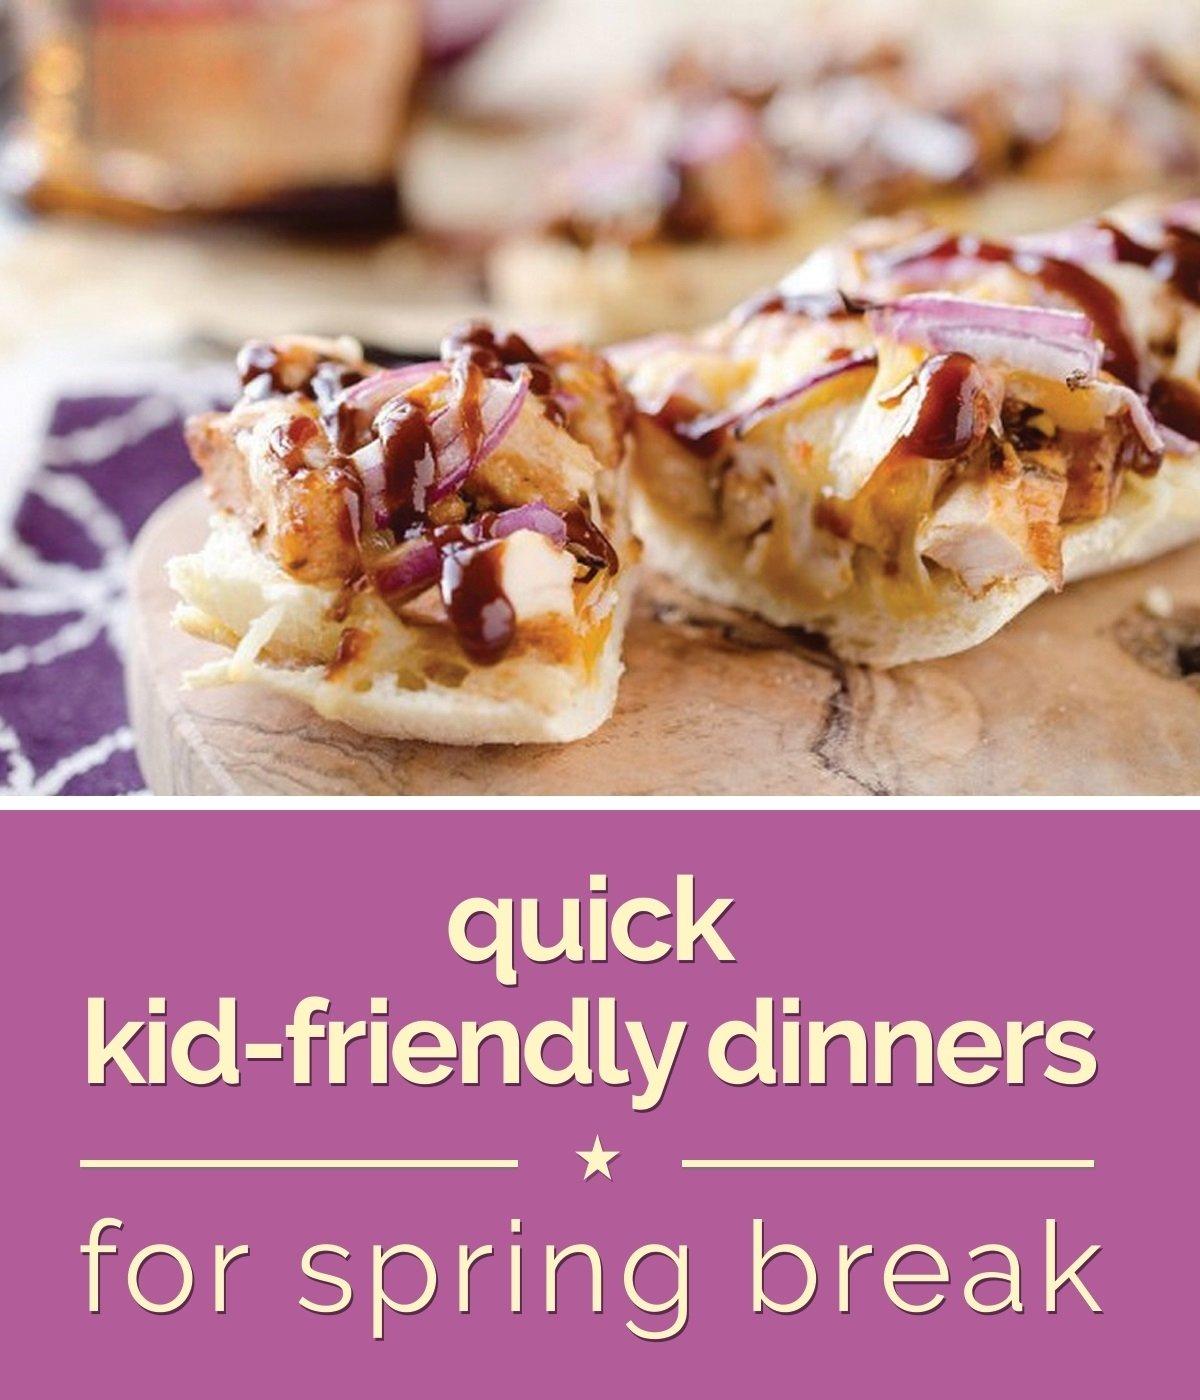 10 Great Quick Kid Friendly Dinner Ideas quick kid friendly dinners for spring break thegoodstuff 2021